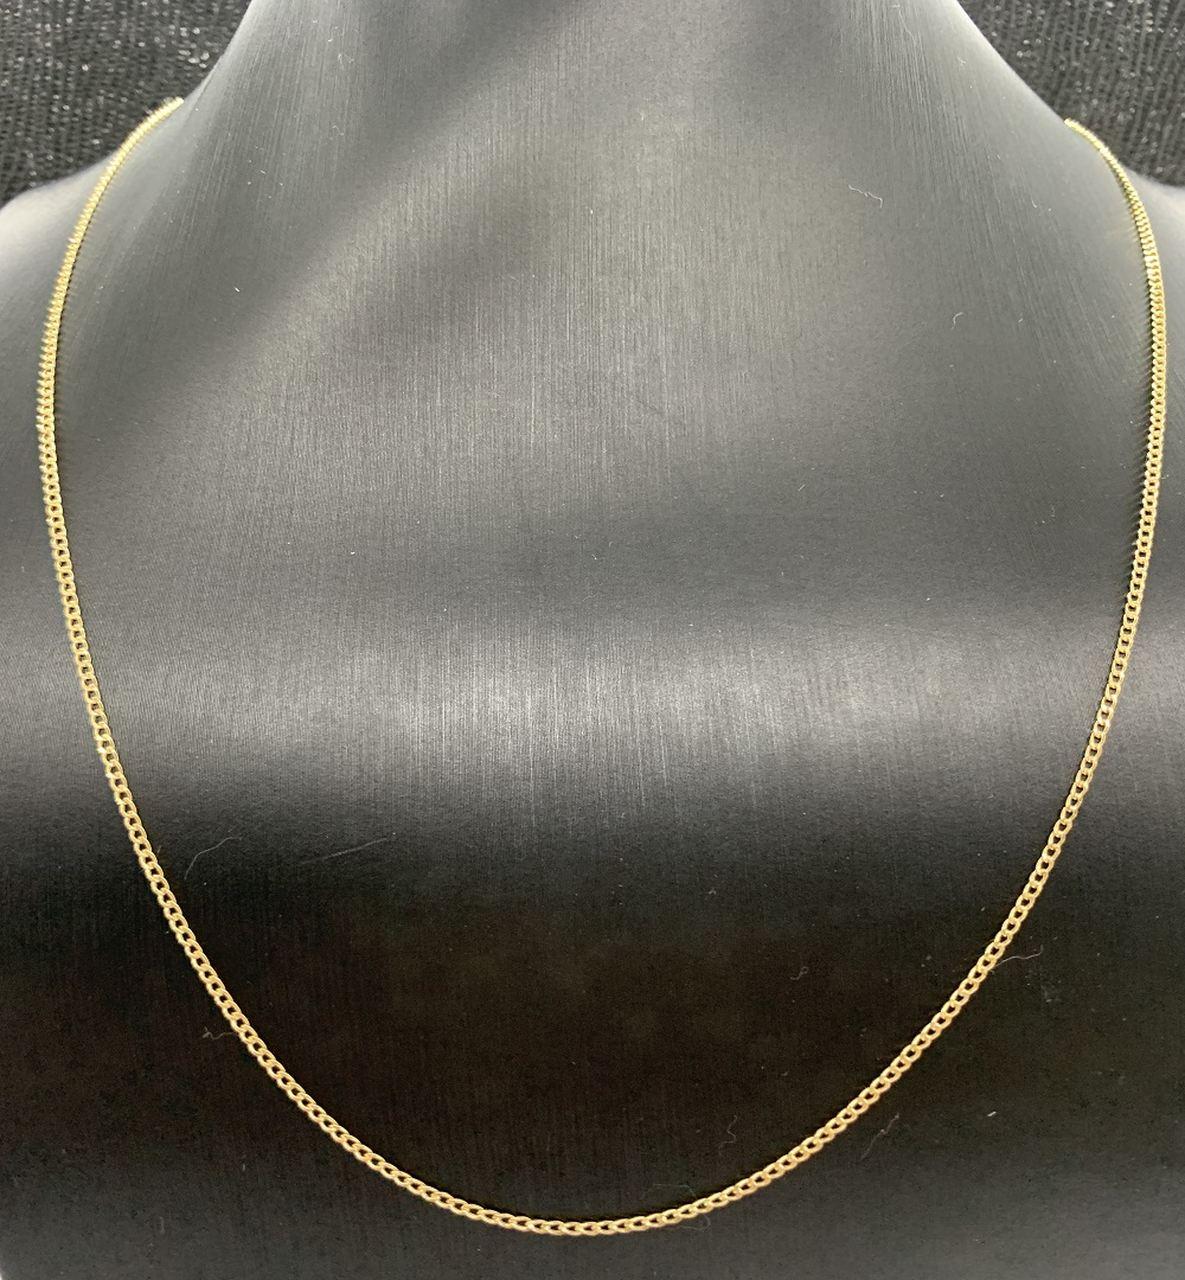 Corrente Ouro 18K Groumet 3280001-90